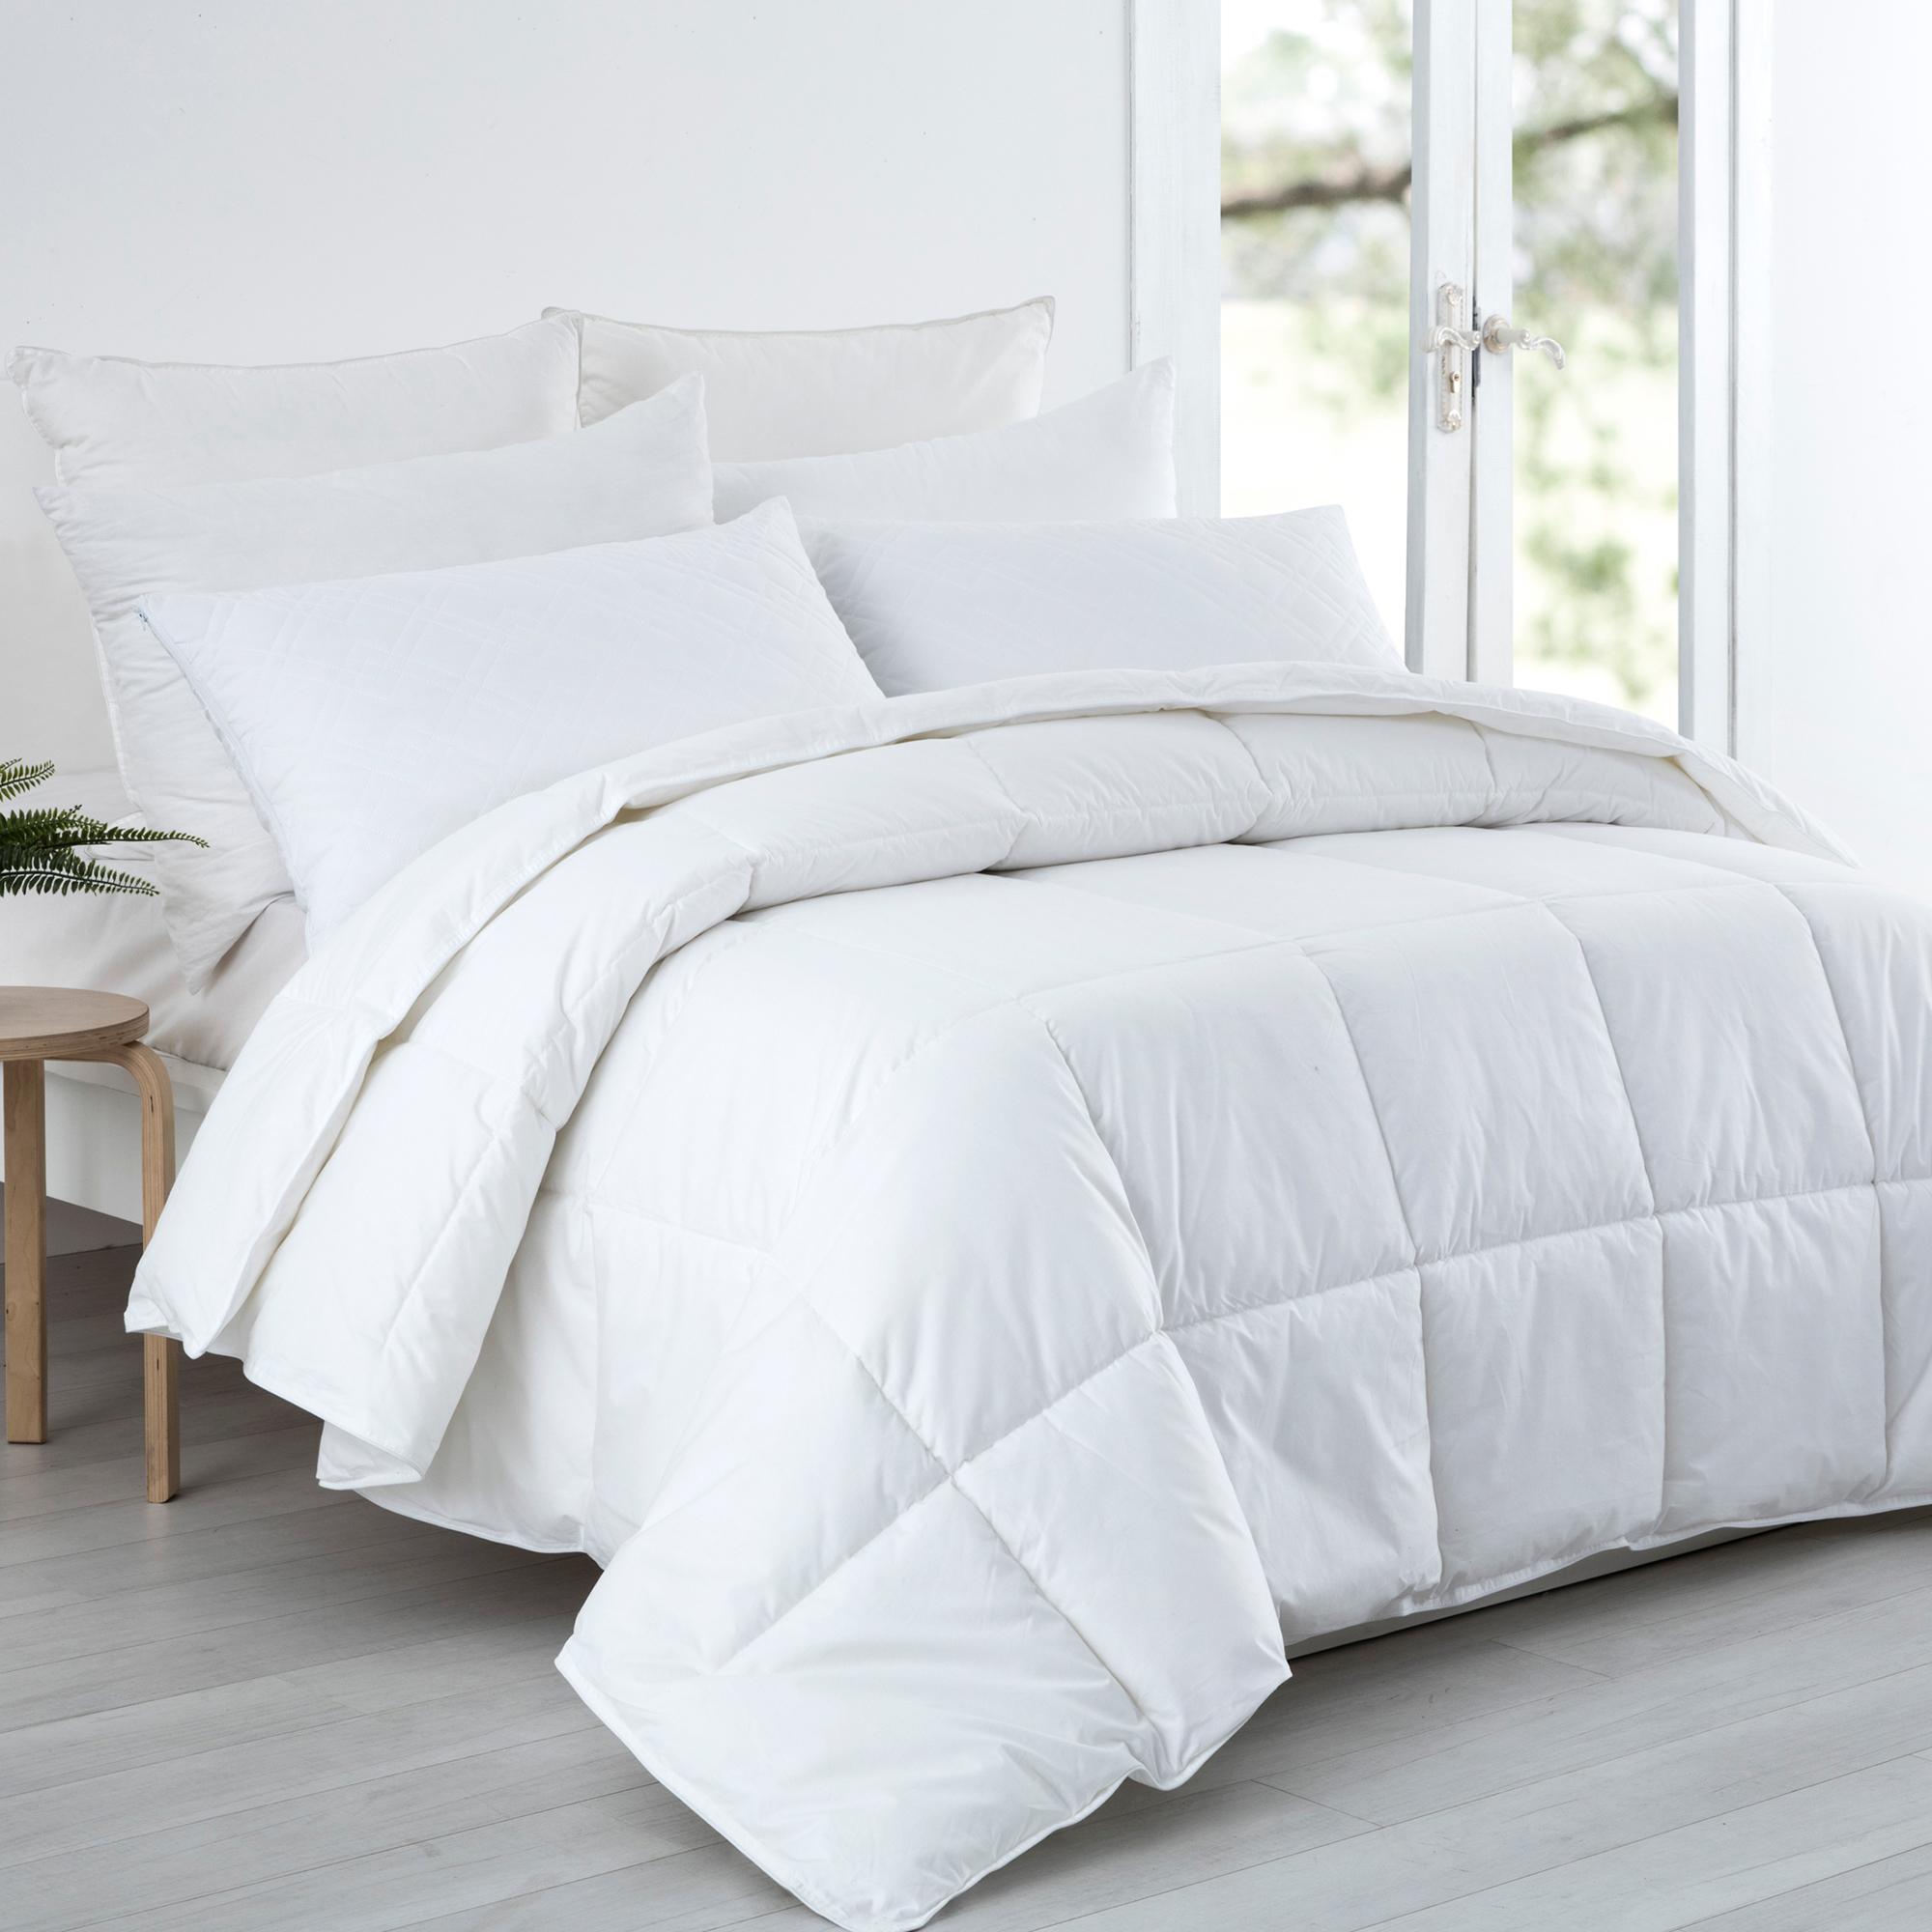 as pillows bed slide aloha bedding bamboo sheets soft home slider